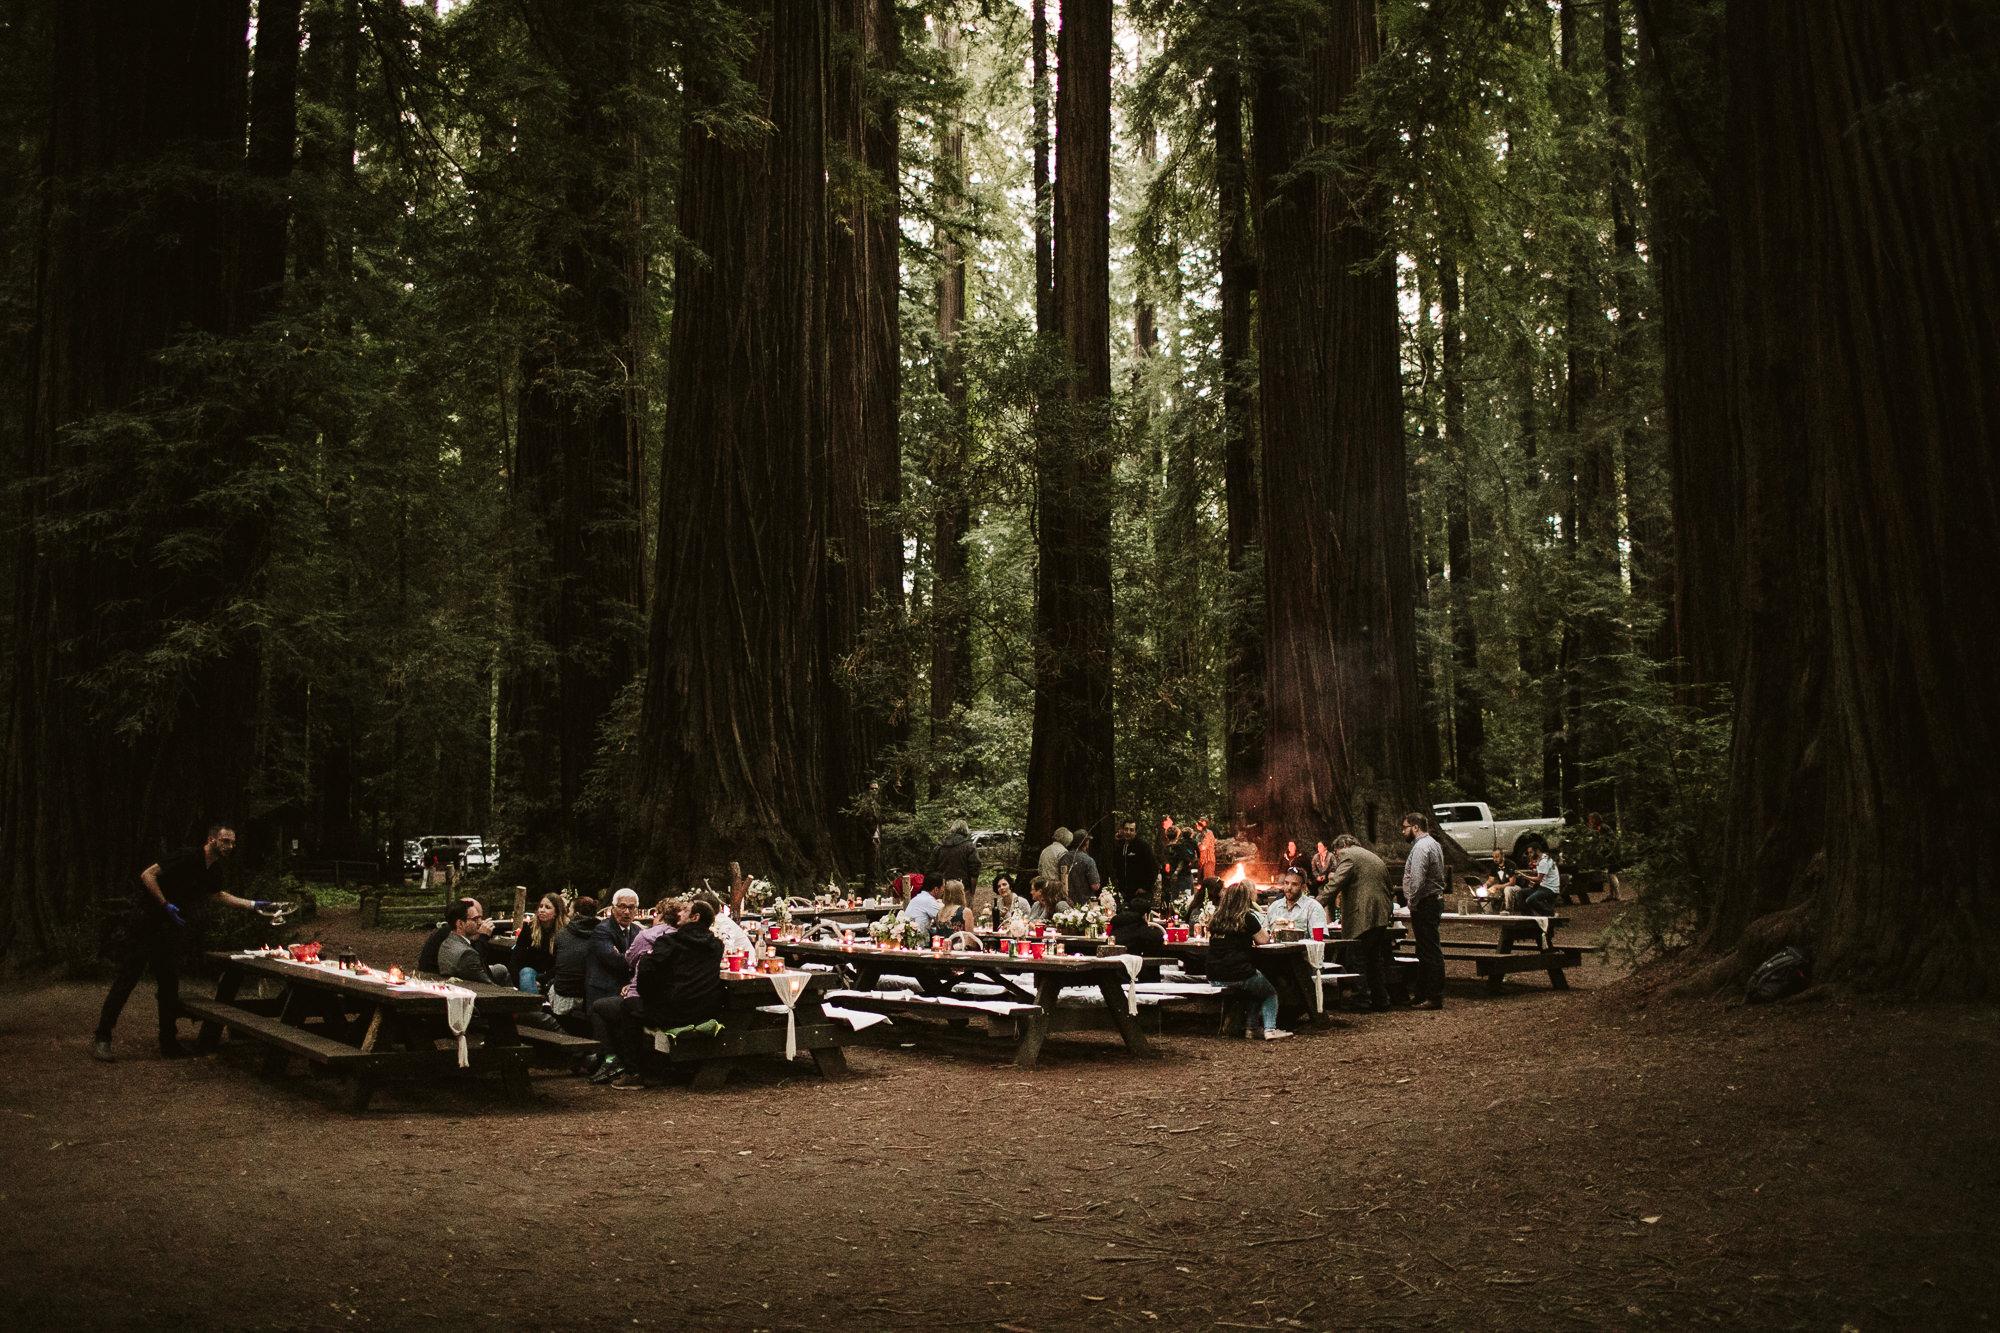 California-wedding-photographer-alfonso-flores-pamplin-groove-340.jpg